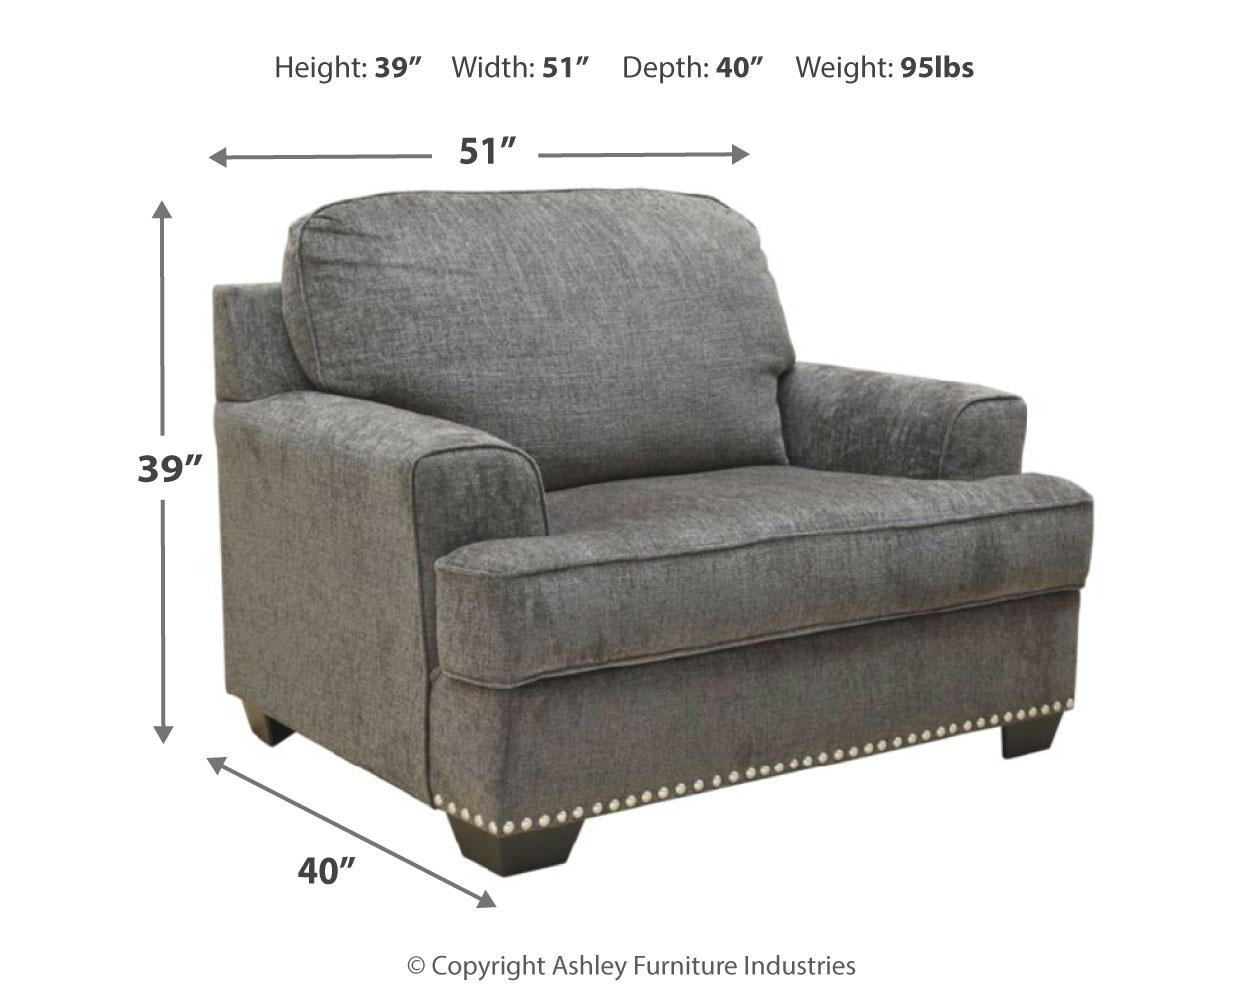 Locklin Oversized Chair By Benchcraft Nis869521233 Callan Furniture